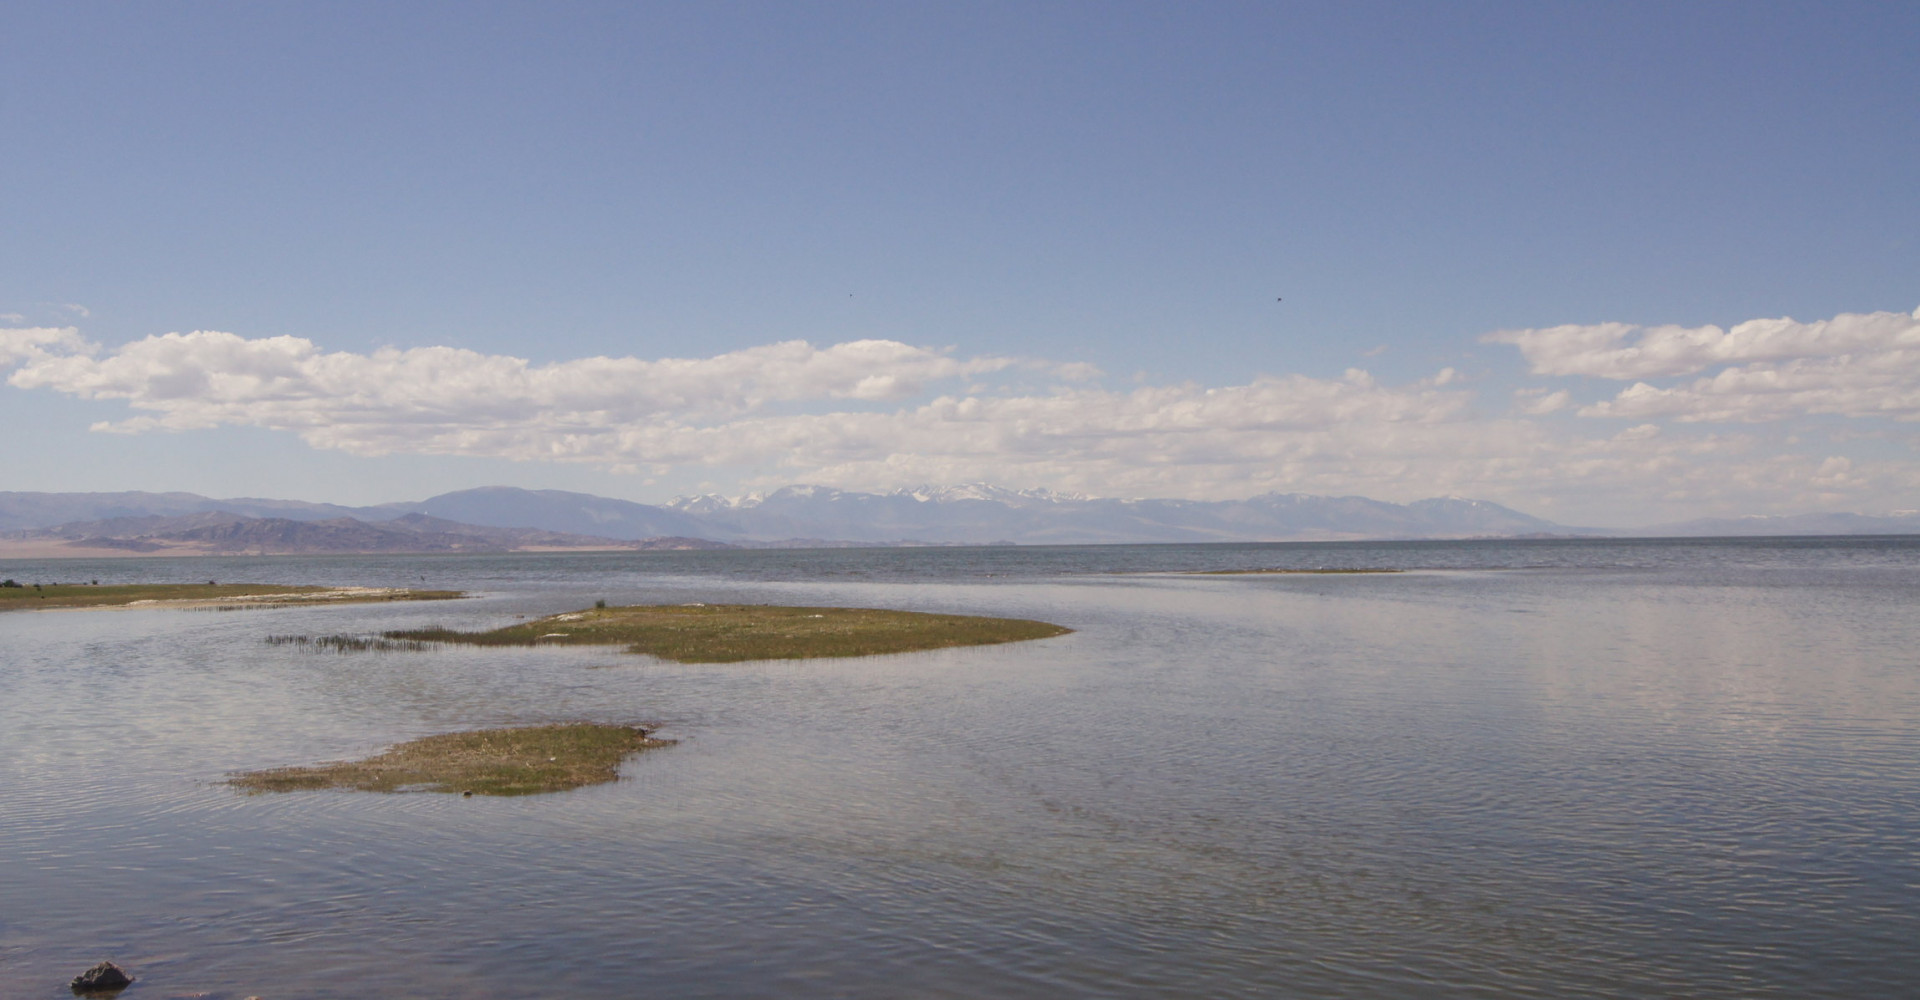 Devliin Aral (Island) National Reserve